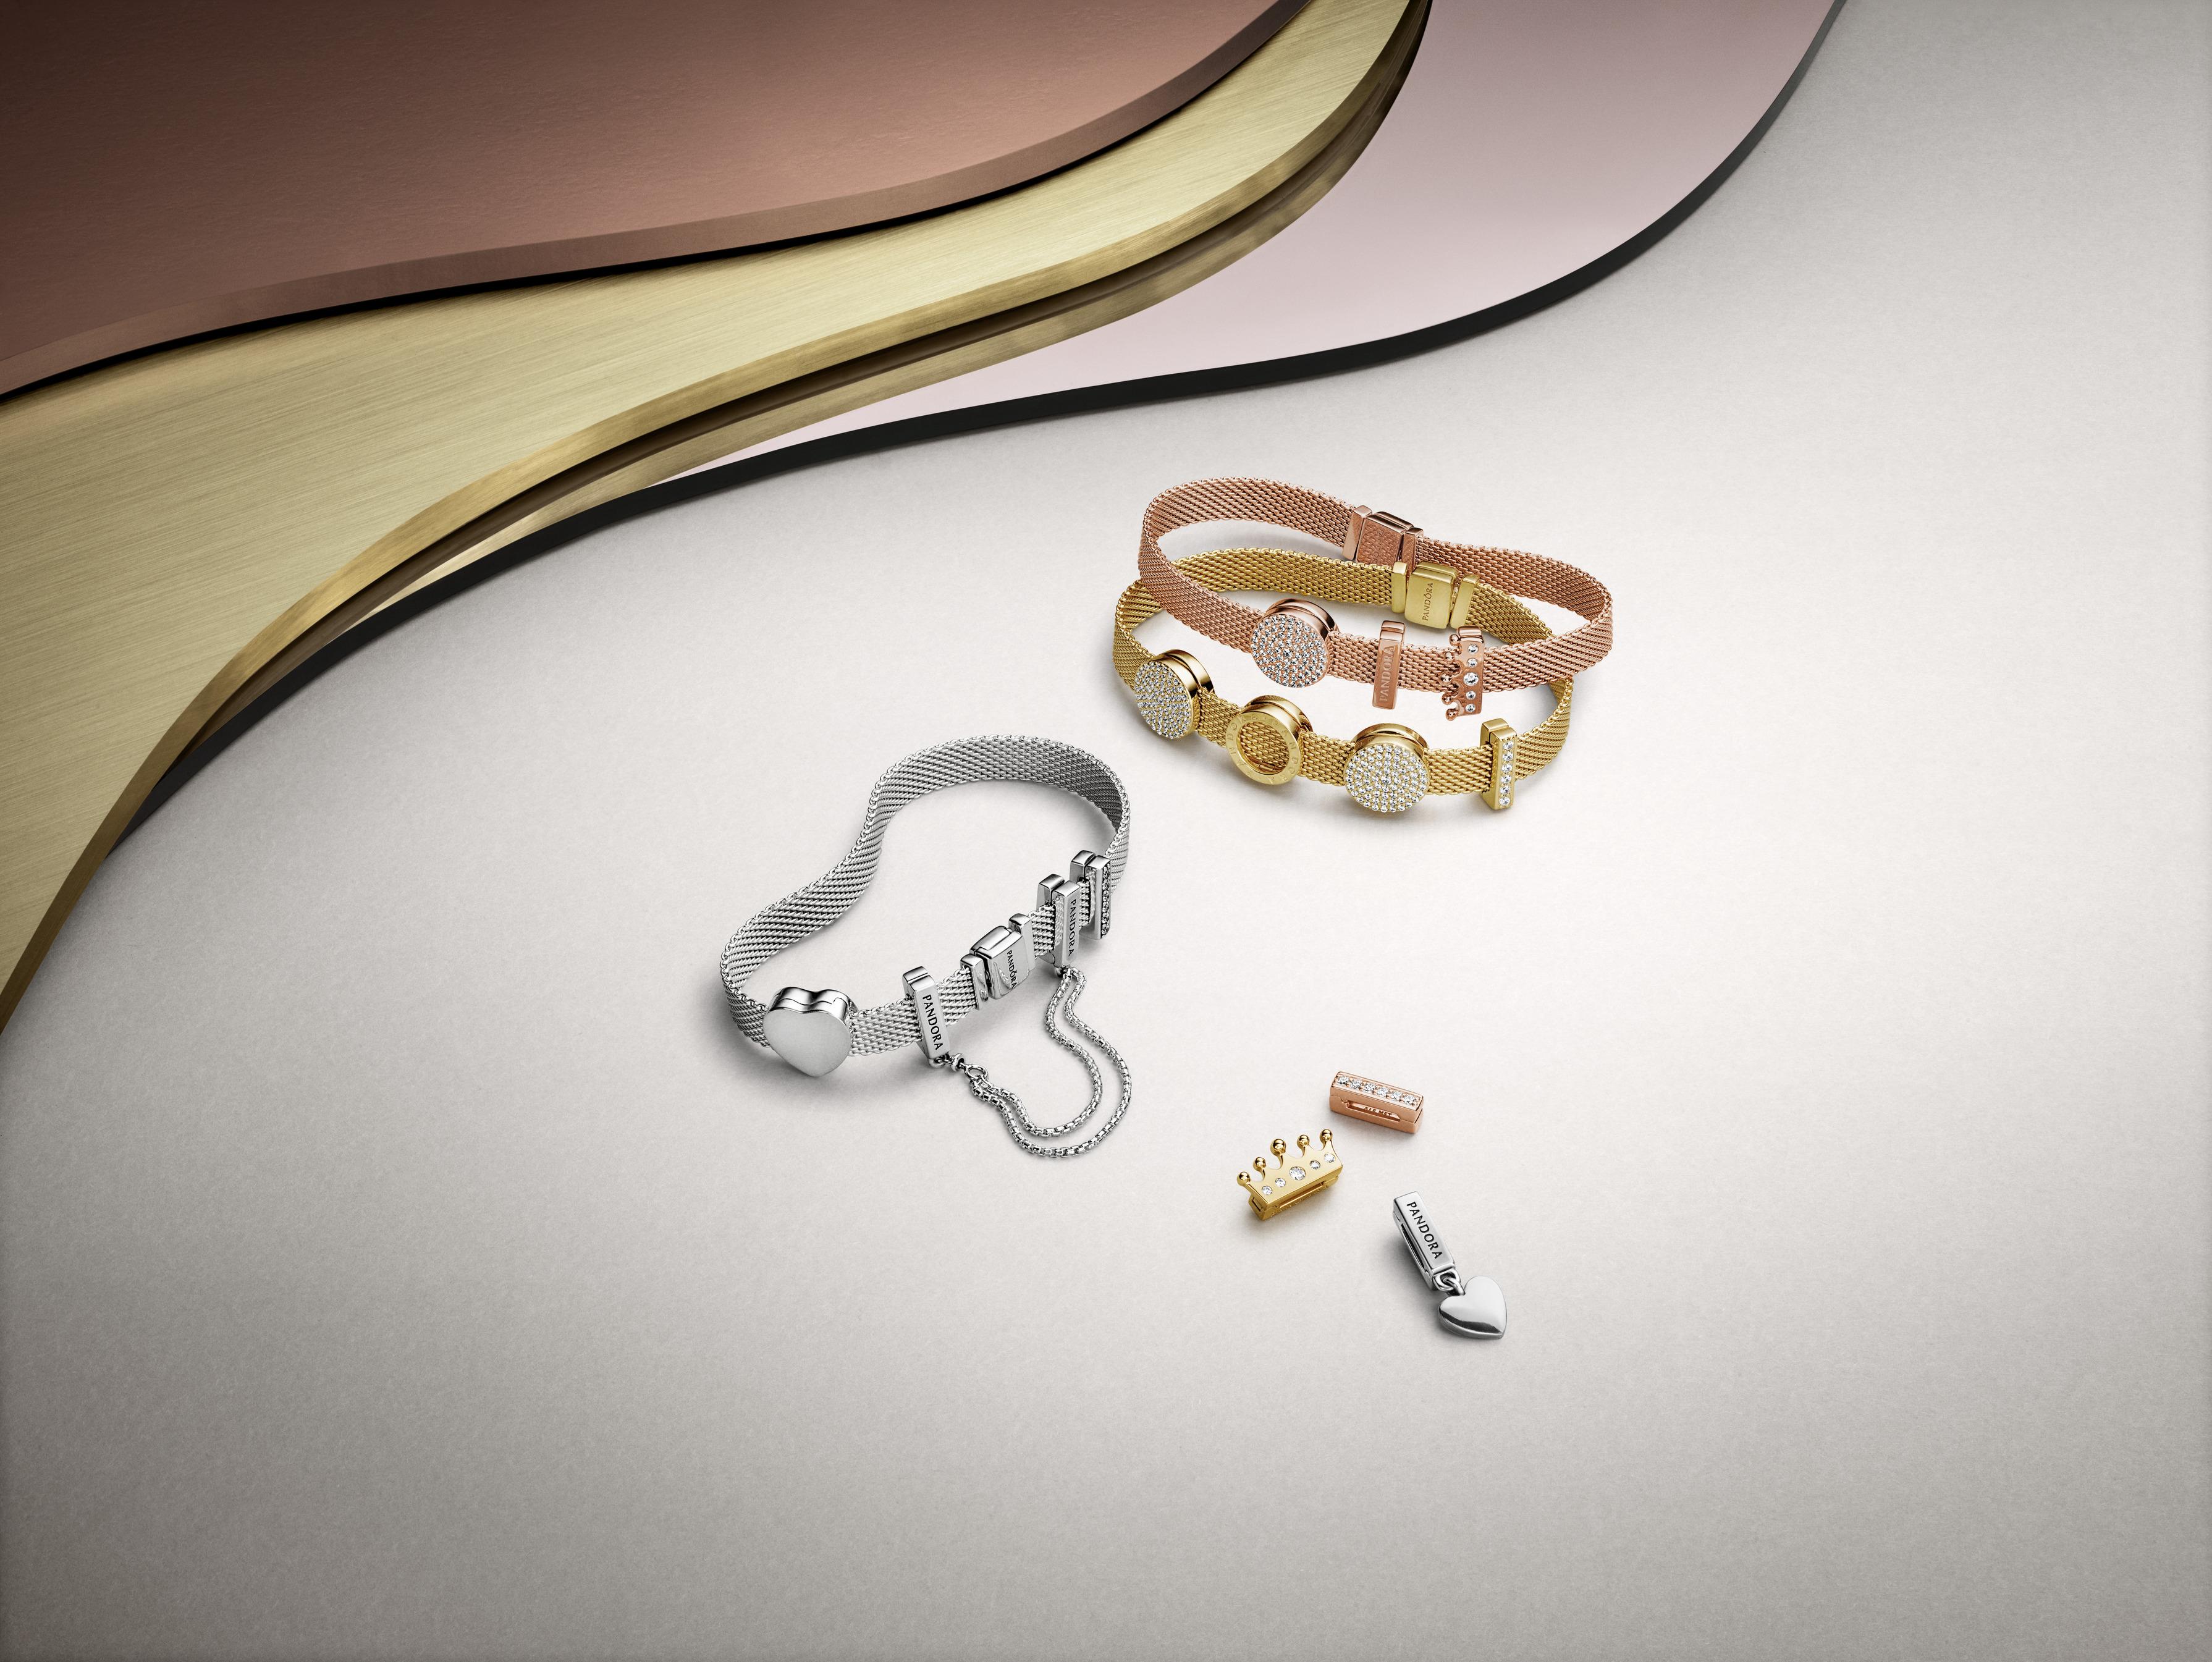 2e239979d spain forever pandora hearts stud earrings a9d3f 15e06; good pandora  launches new bracelet concept copenhagen stock exchangepndora 33d32 a6f18